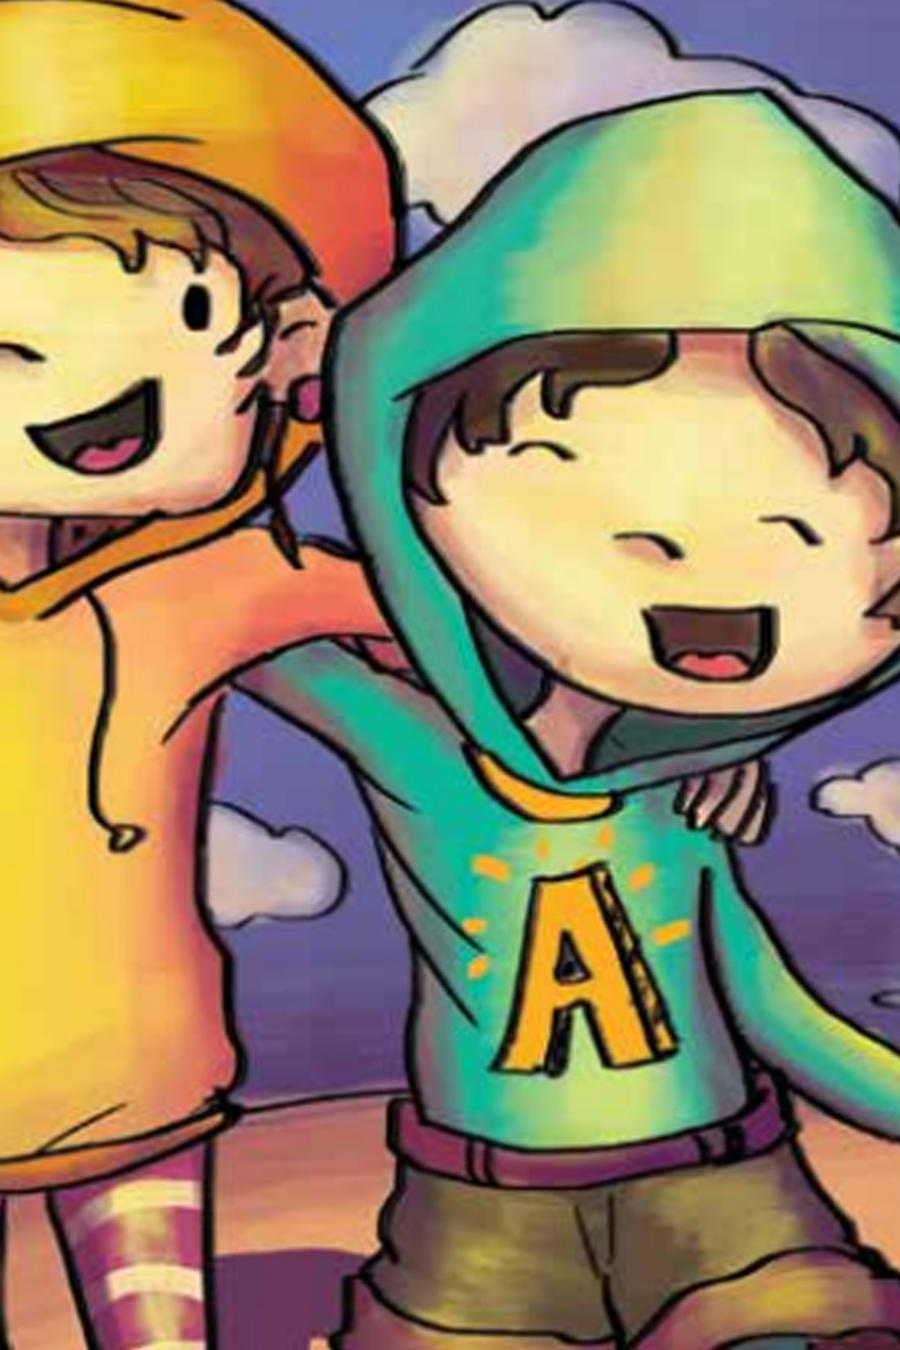 Ilustración de dos niños abrazados